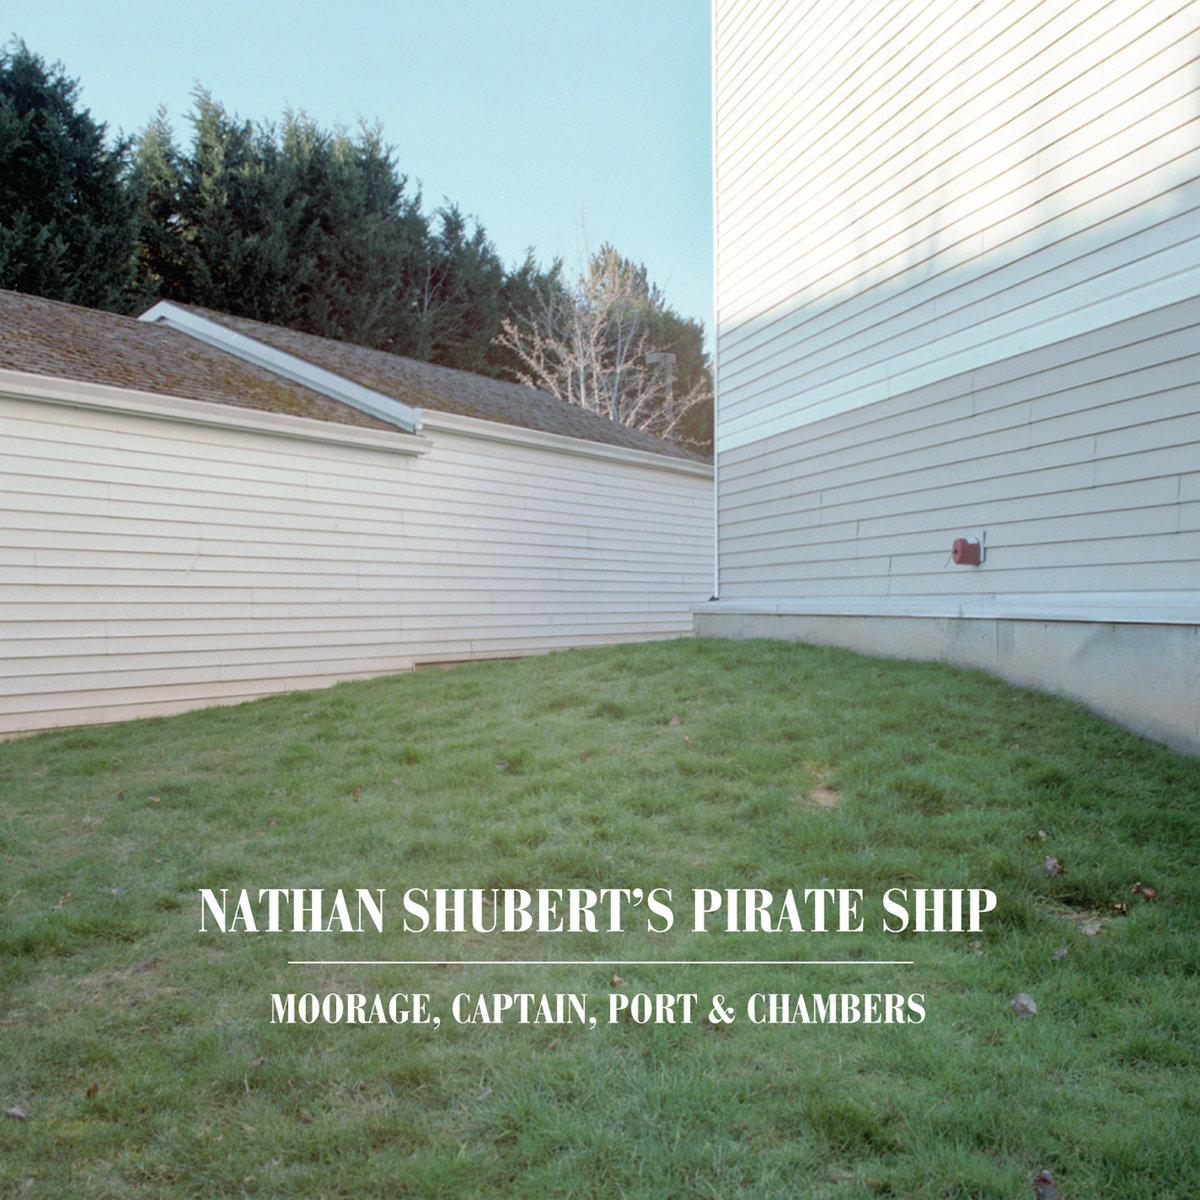 Nathan Shubert's Pirate Ship artwork